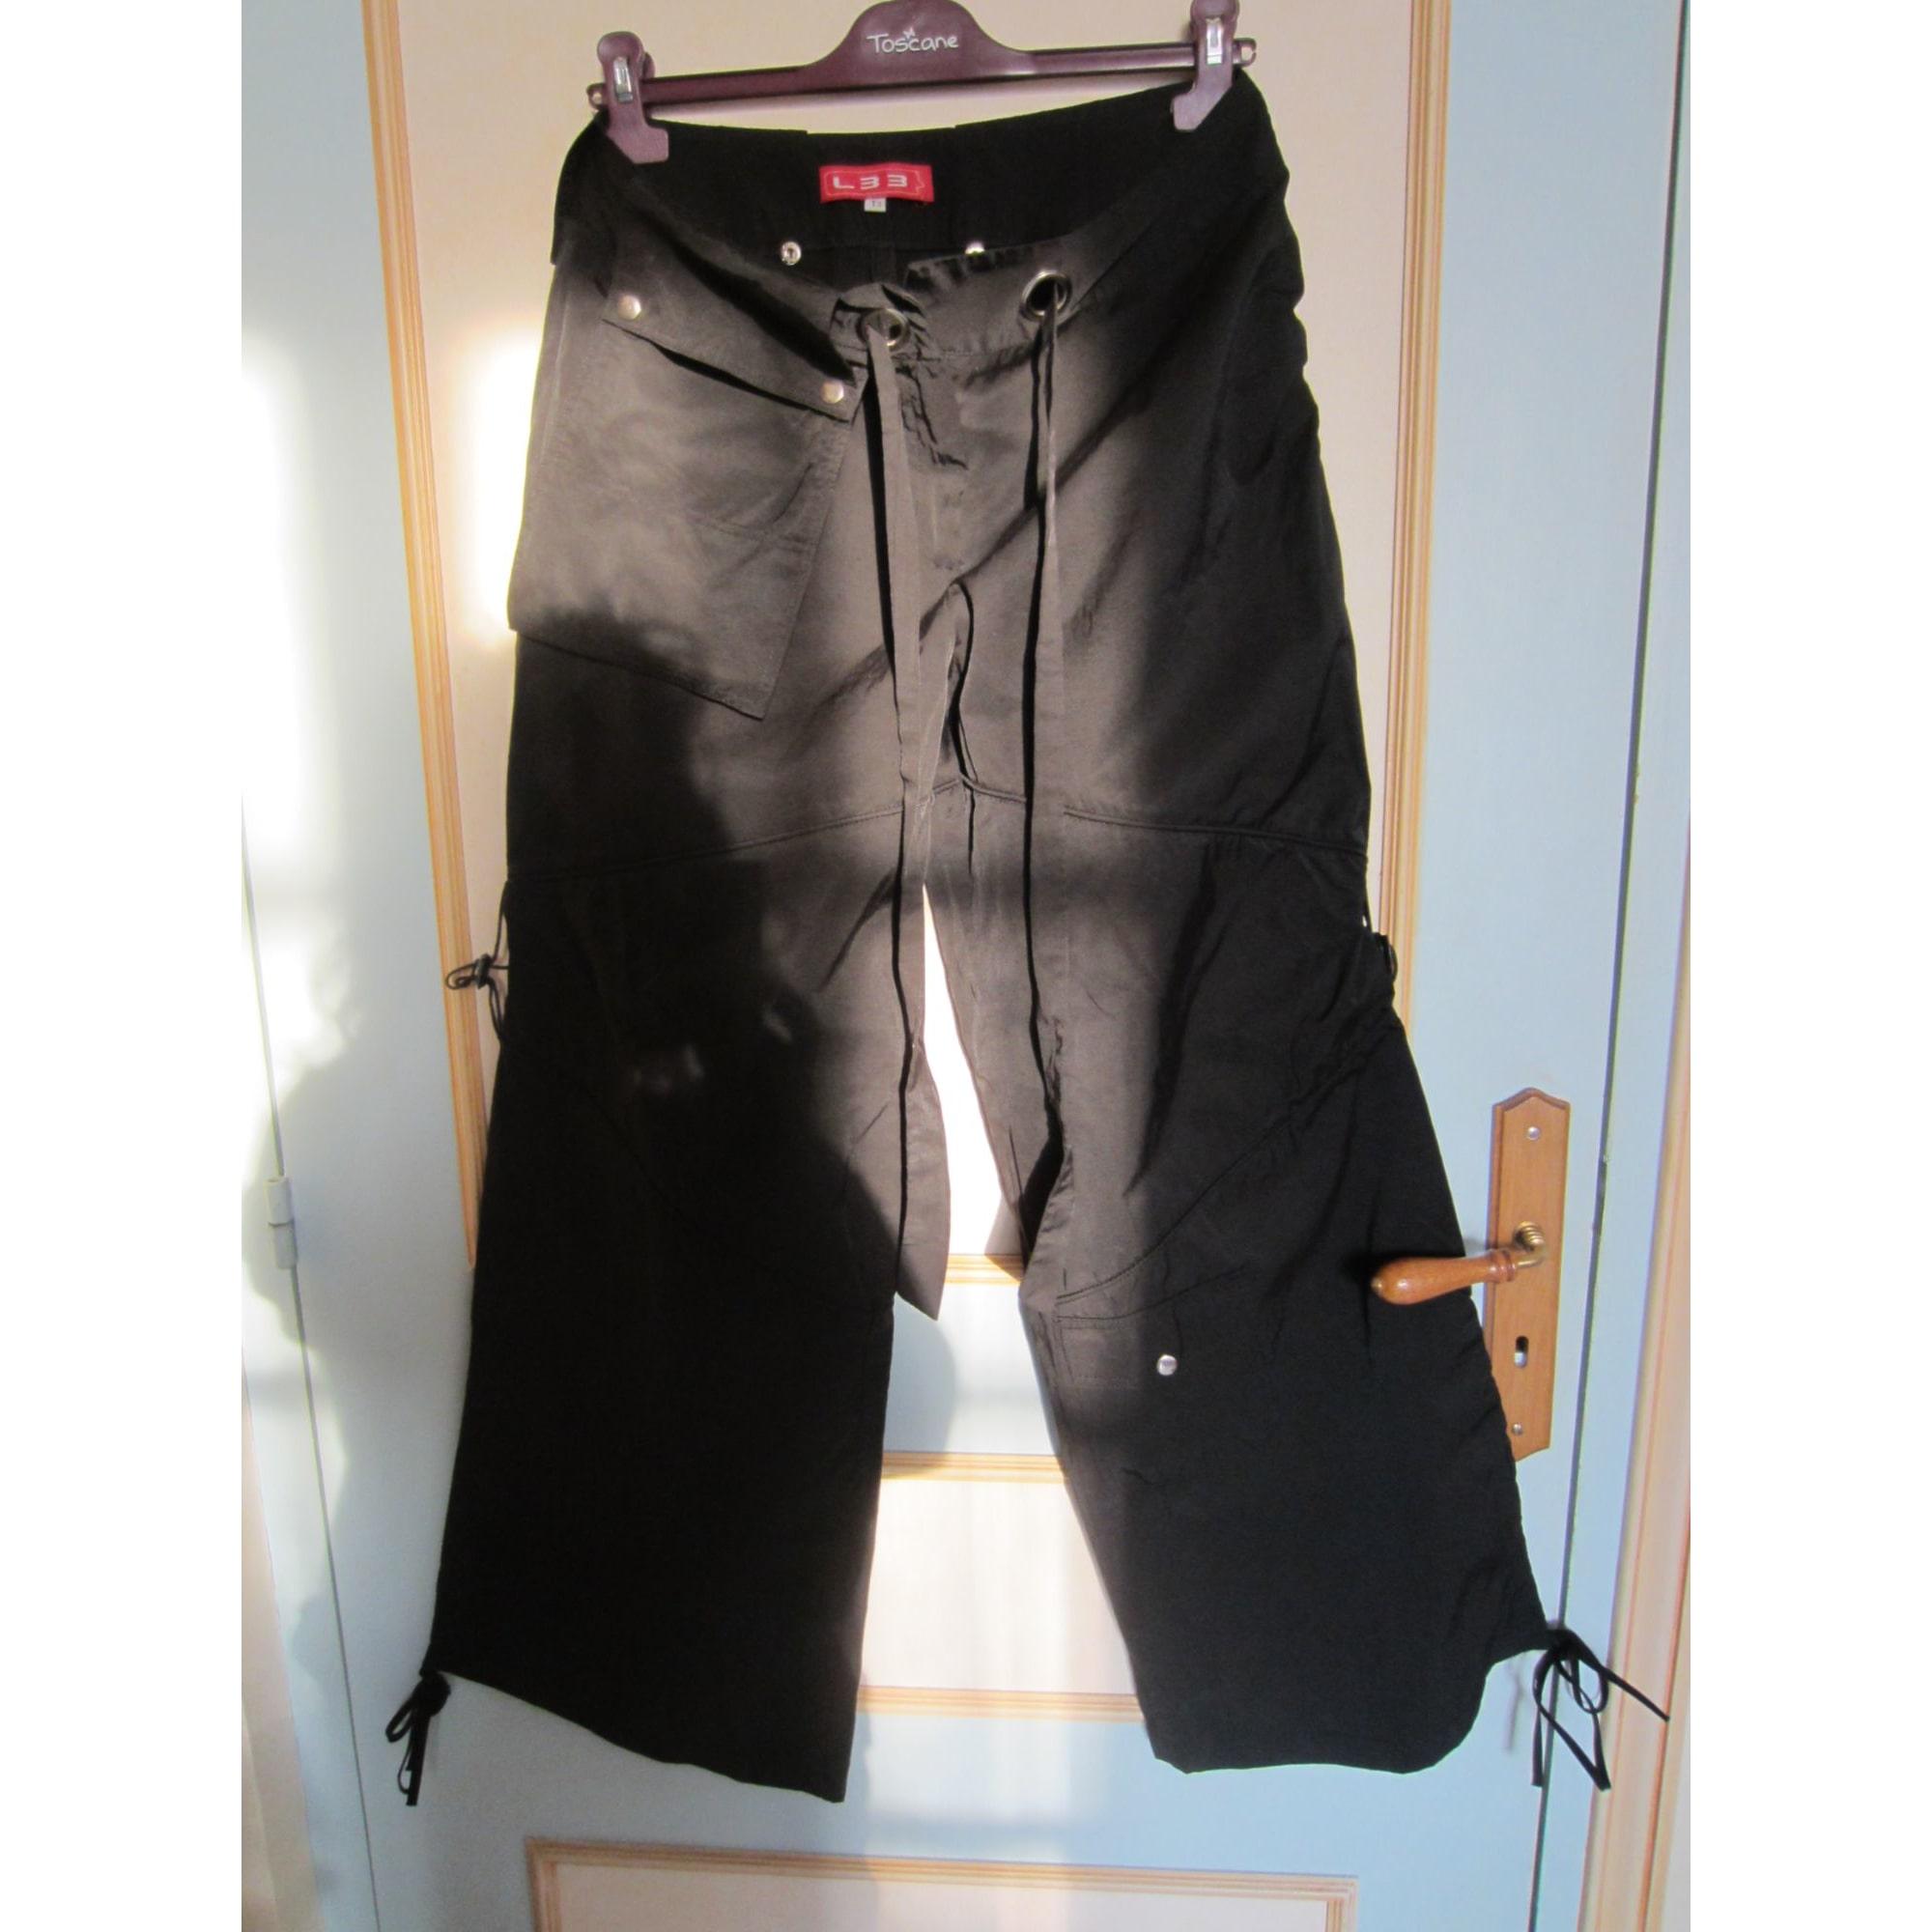 Pantalone Largo L33 40 L T3 Nero 4548049